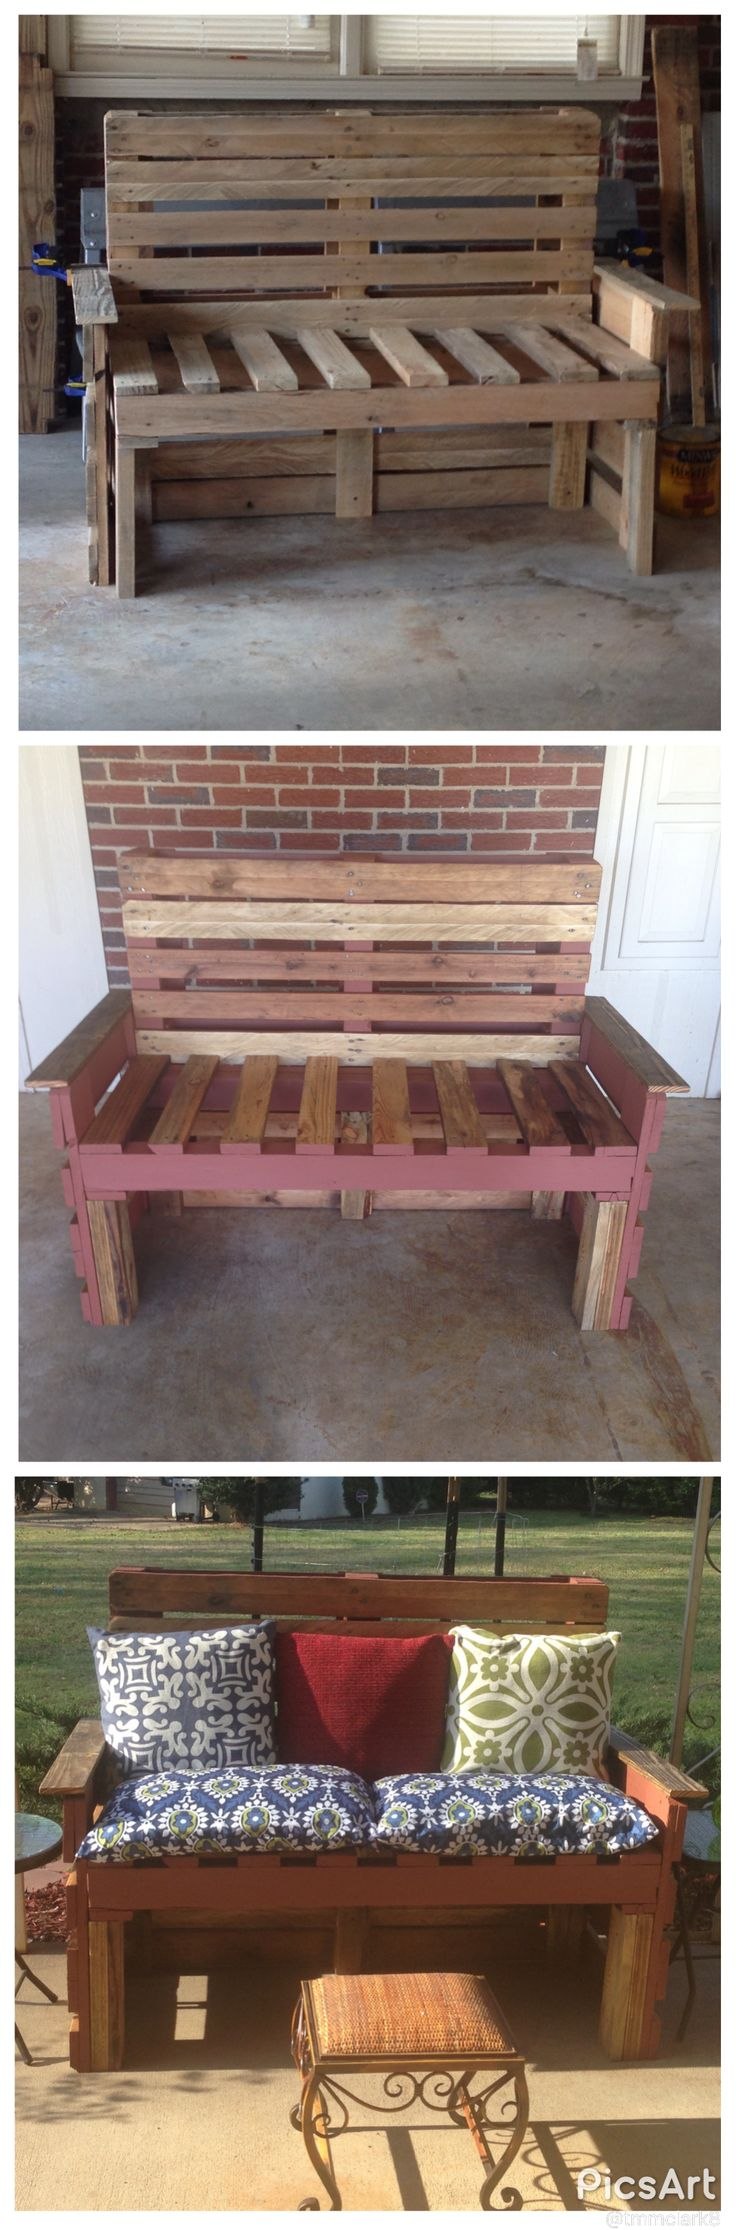 Best 25+ Pallet benches ideas on Pinterest   Pallet bench, Pallet ...